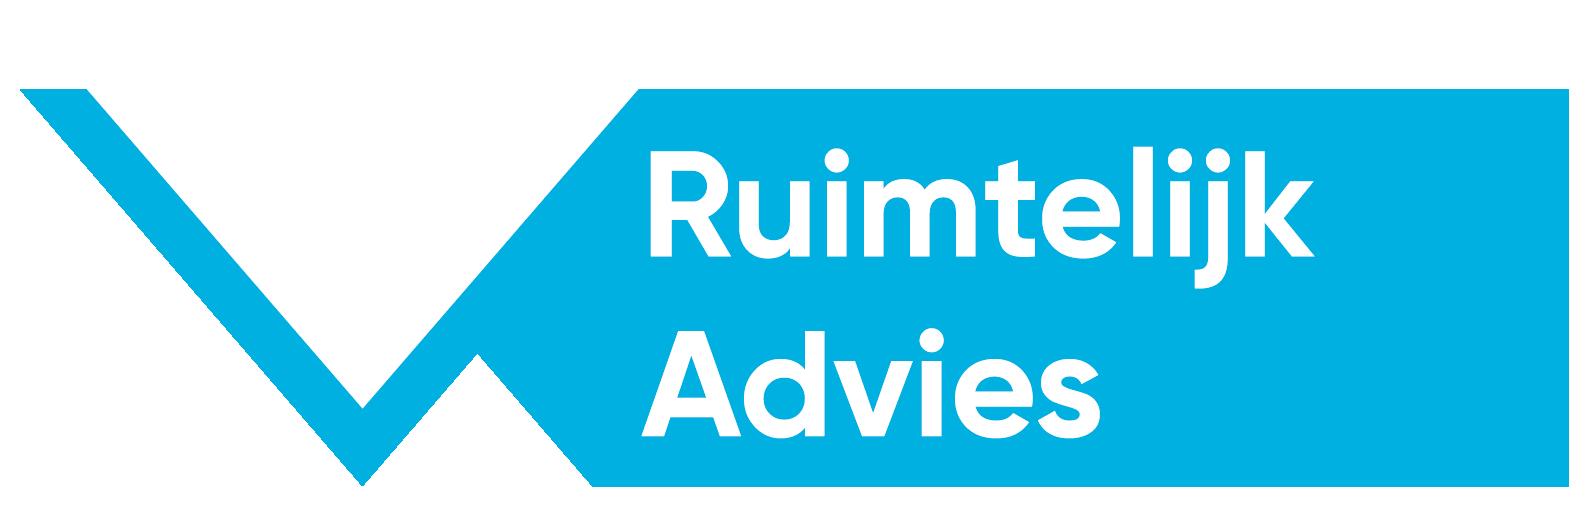 Ruimtelijk-Advies-button